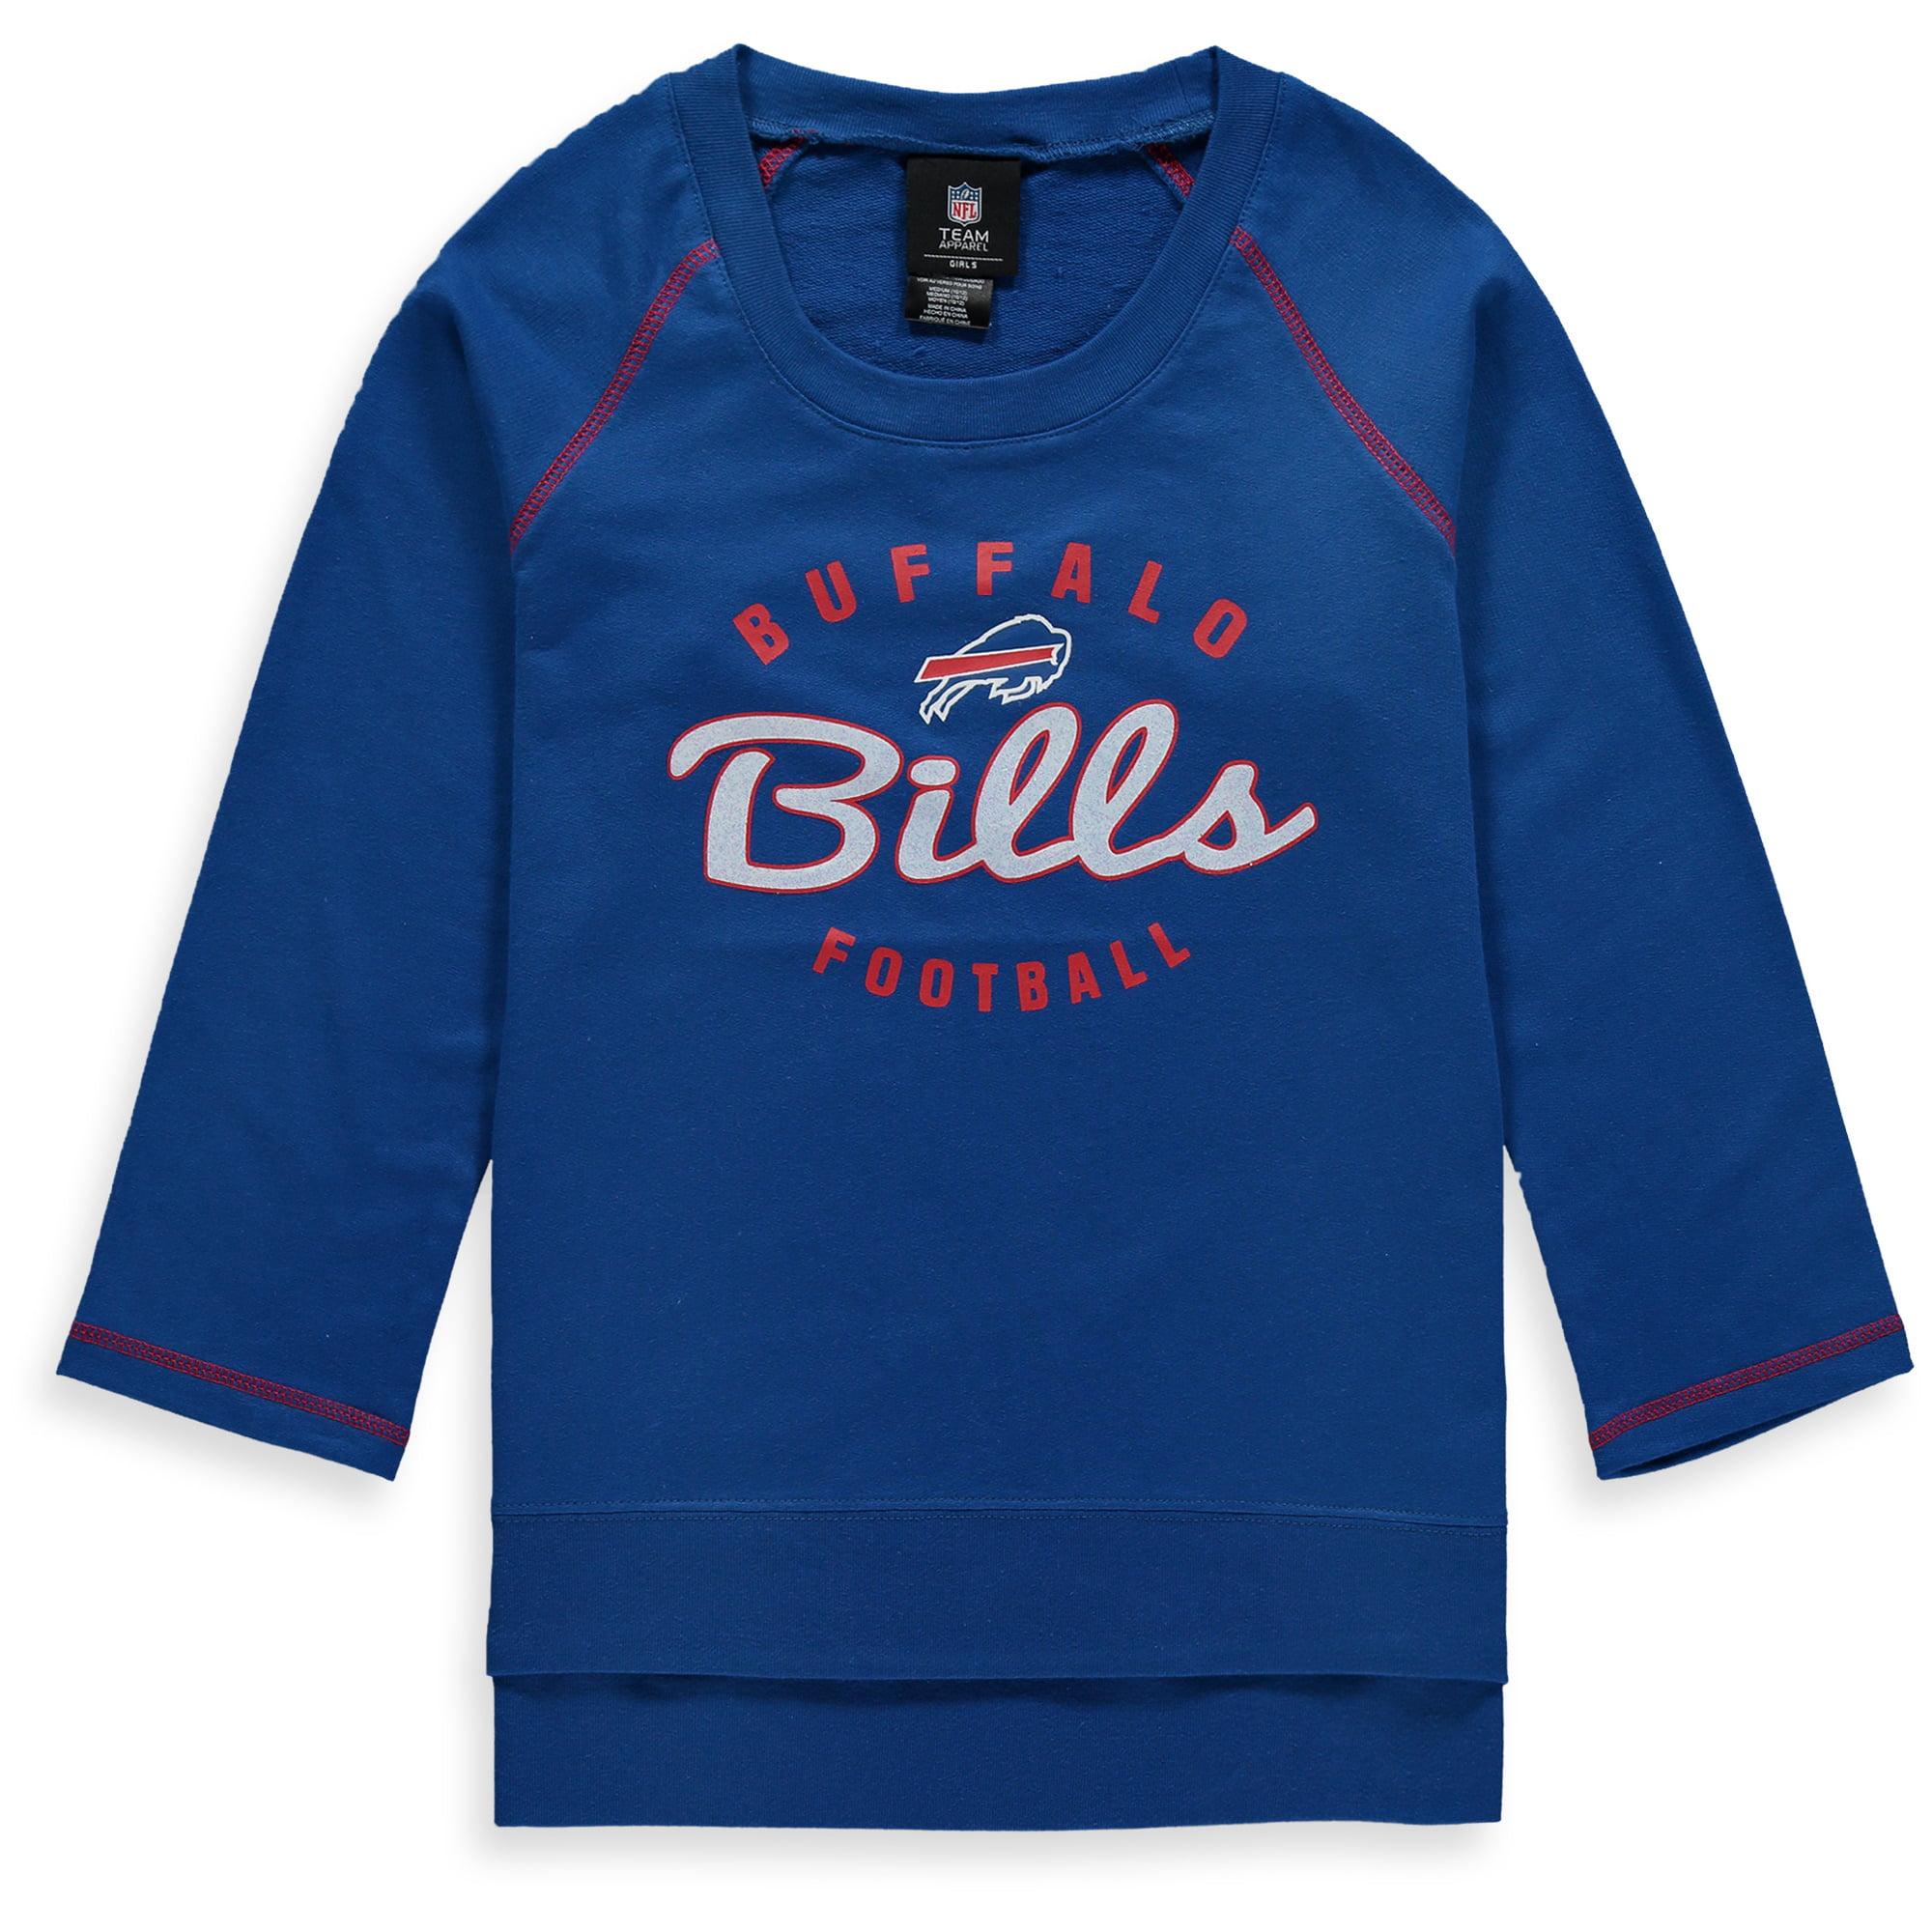 Buffalo Bills Girls Youth Overthrow 3/4-Sleeve Crew Sweatshirt - Royal